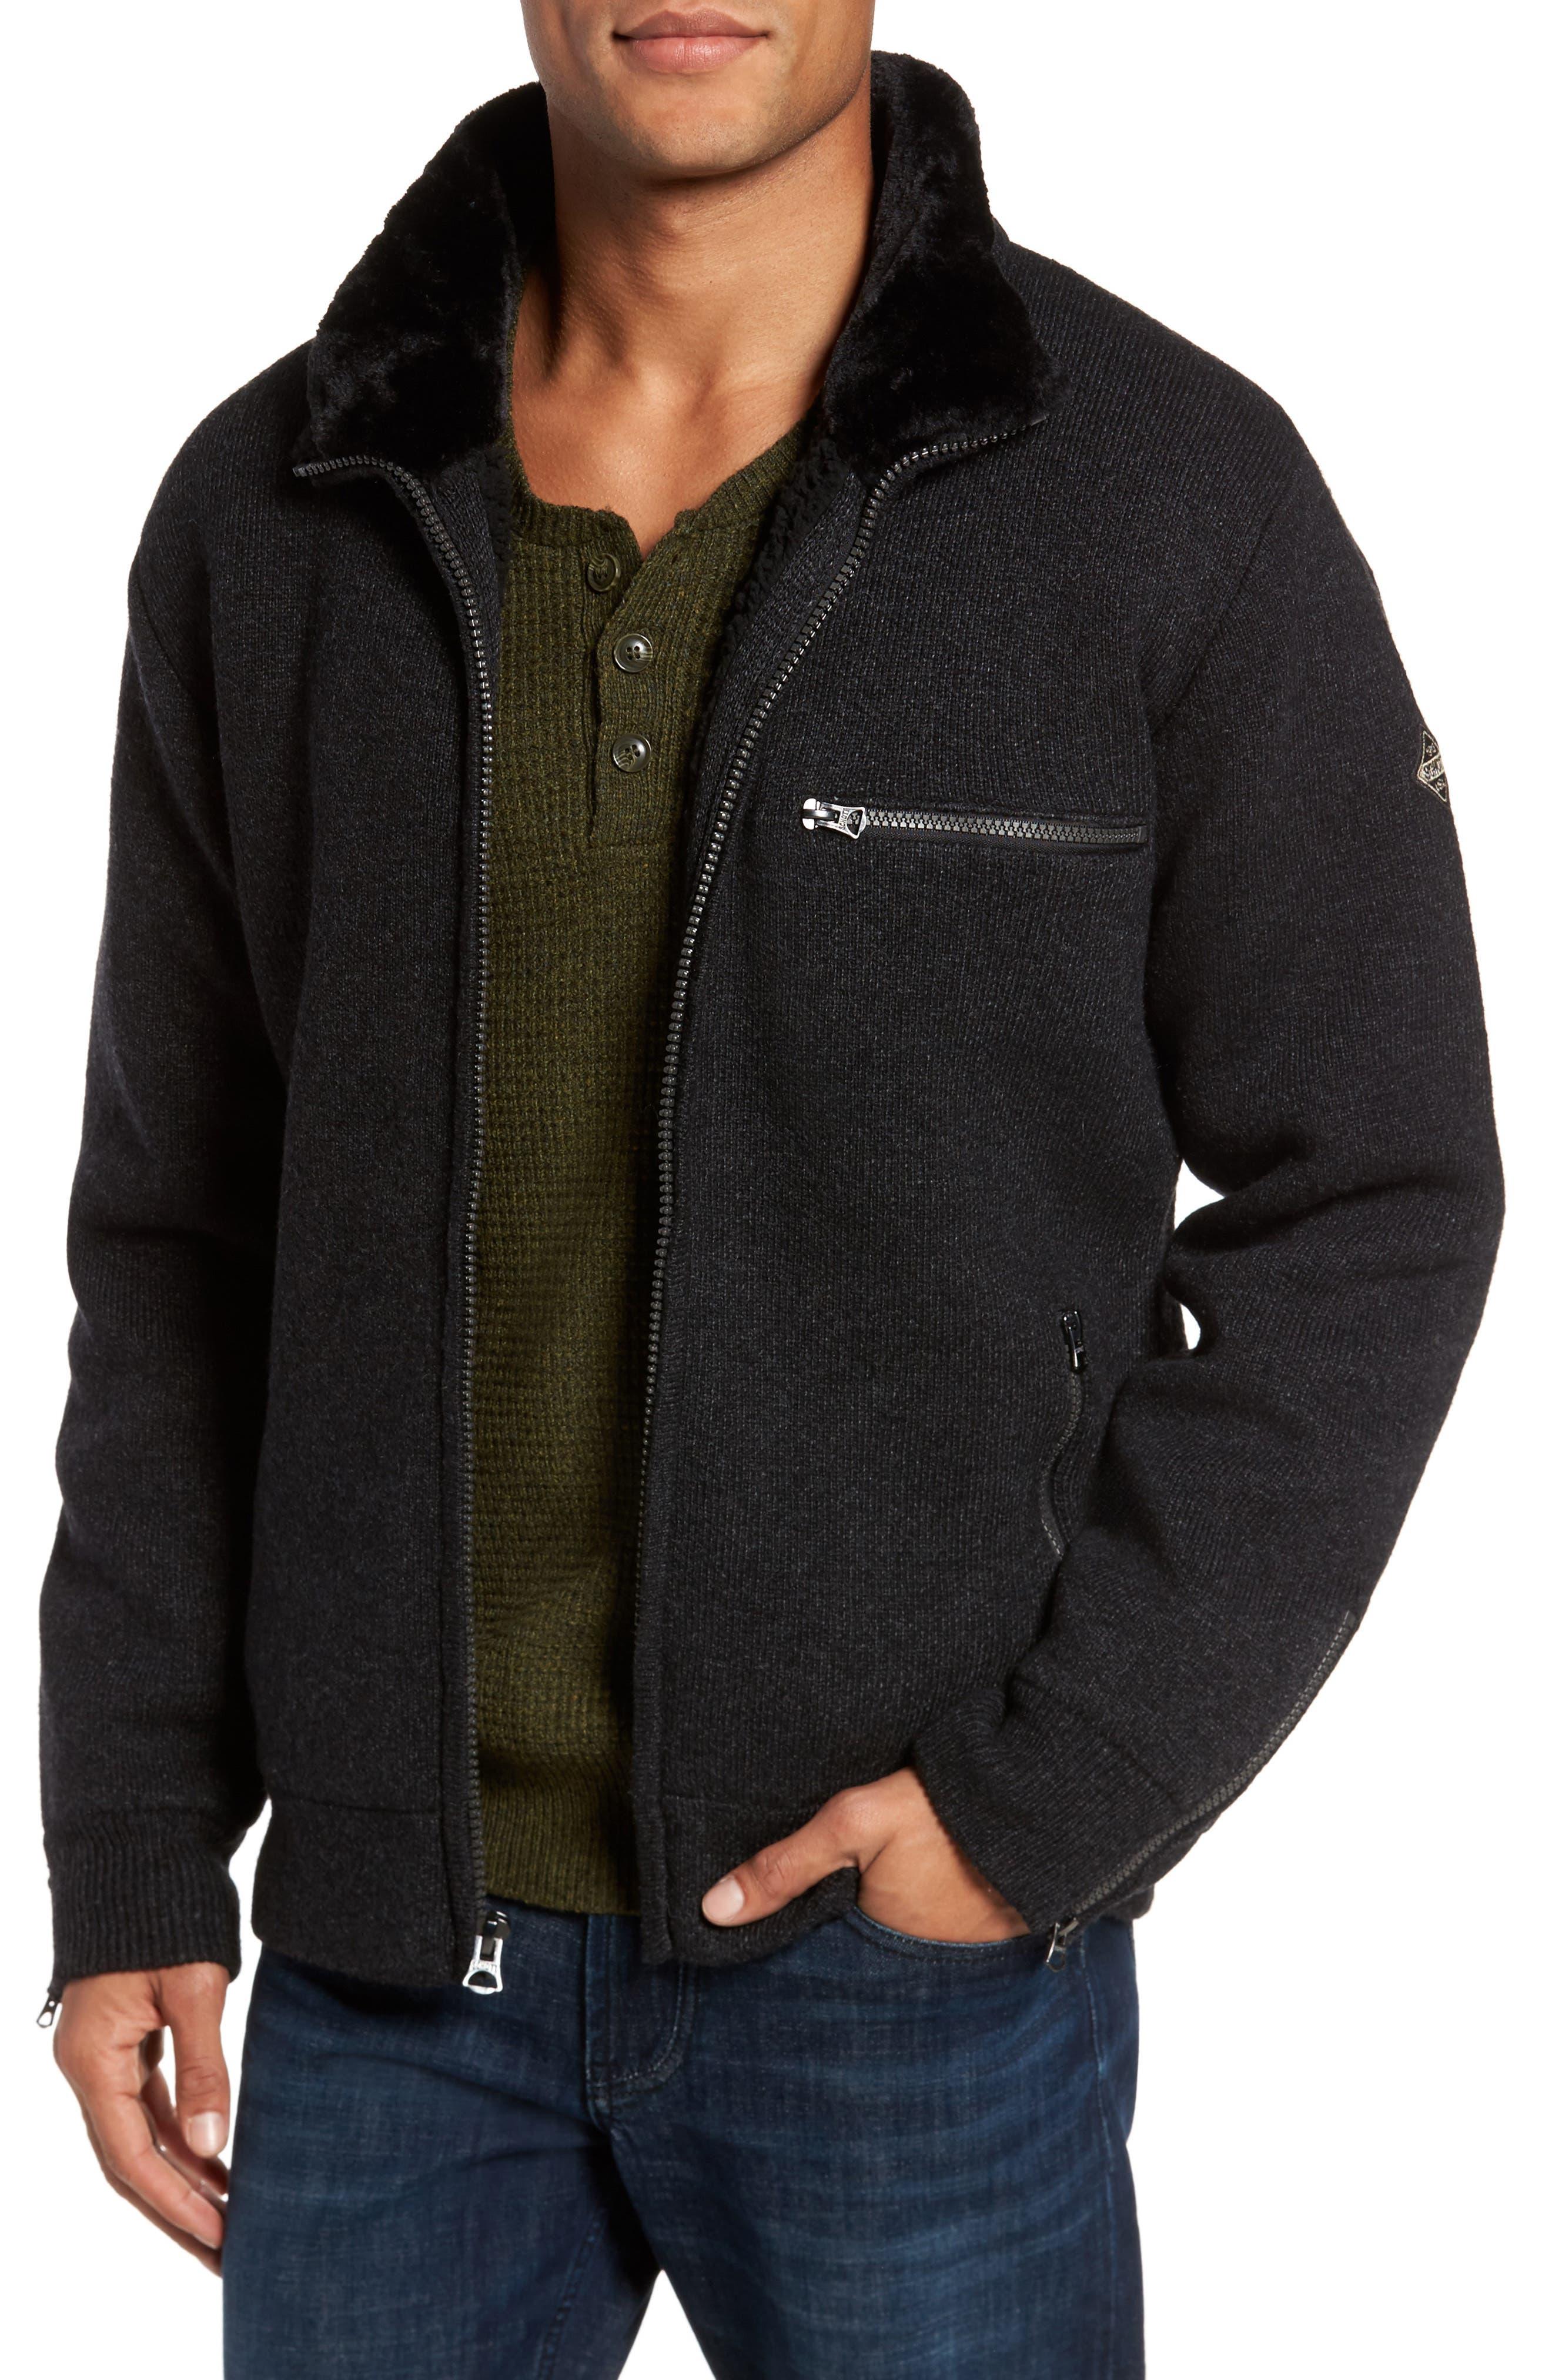 Caf Faux Fur Lined Sweater Jacket,                         Main,                         color, BLACK